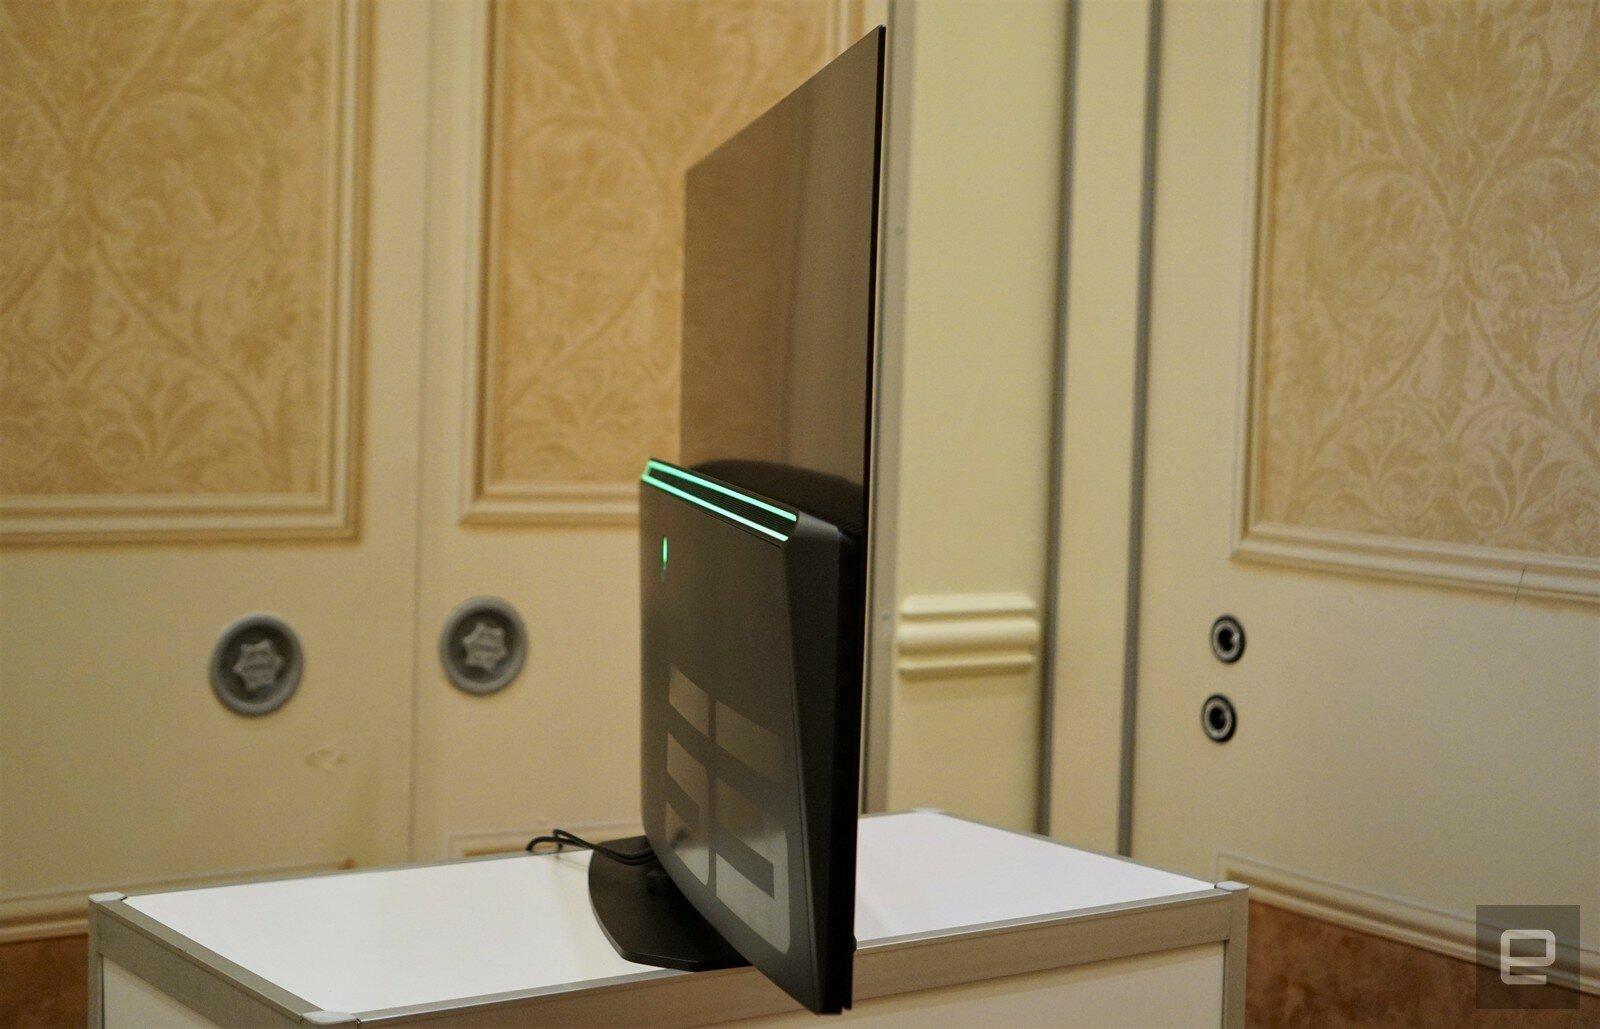 Alienware 55 OLED Monitor